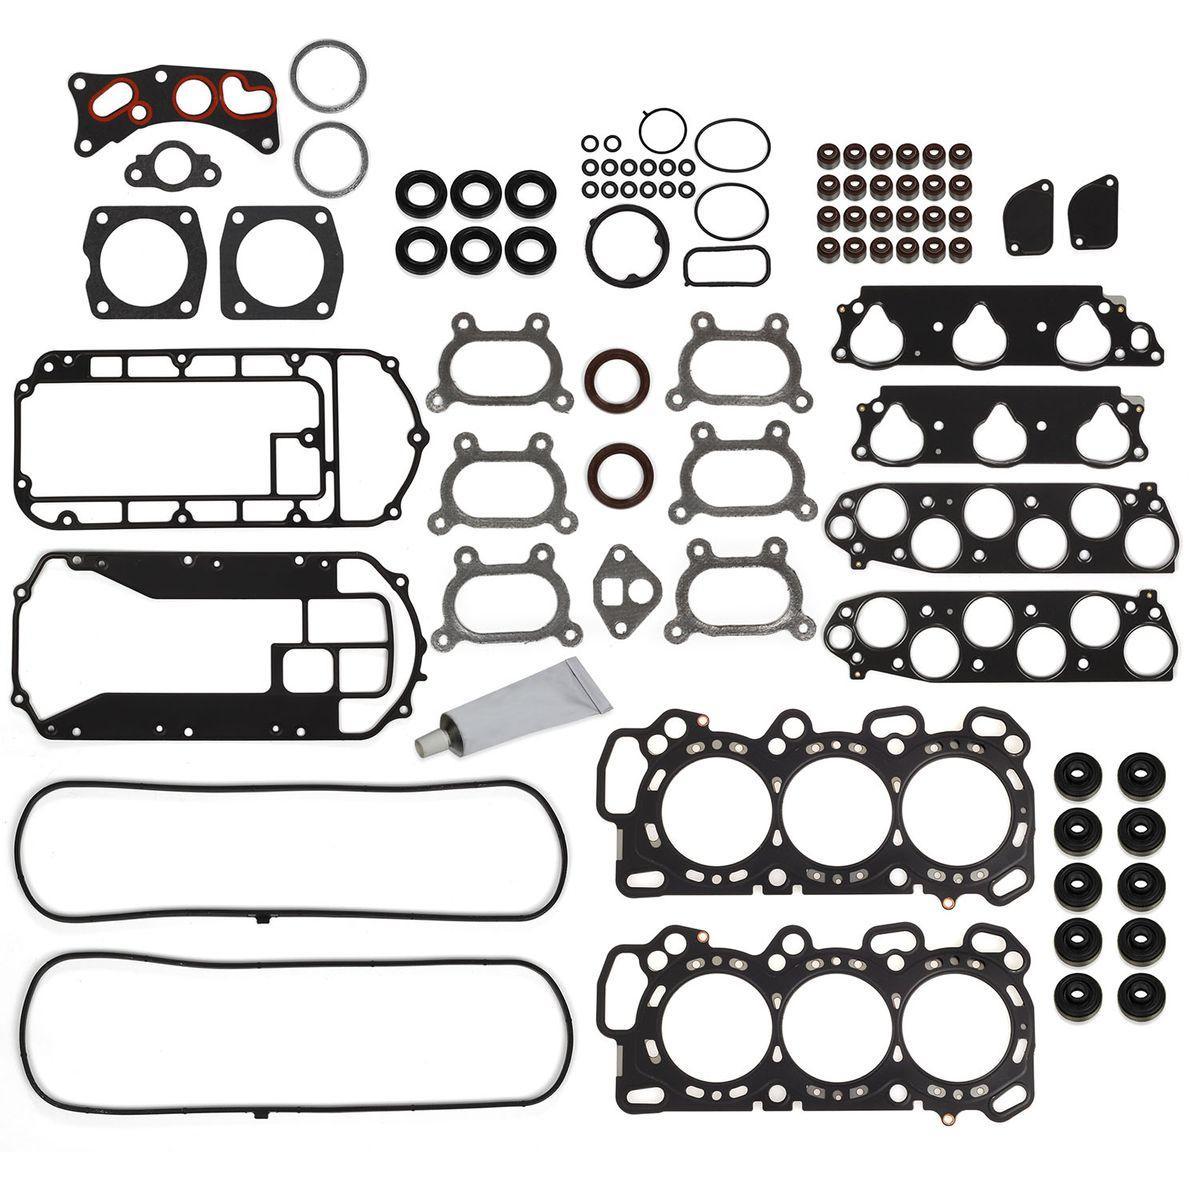 2010 Acura Rdx Camshaft: Engine Head Gasket Set Fits 03-10 Acura Honda Odyssey 3.5L